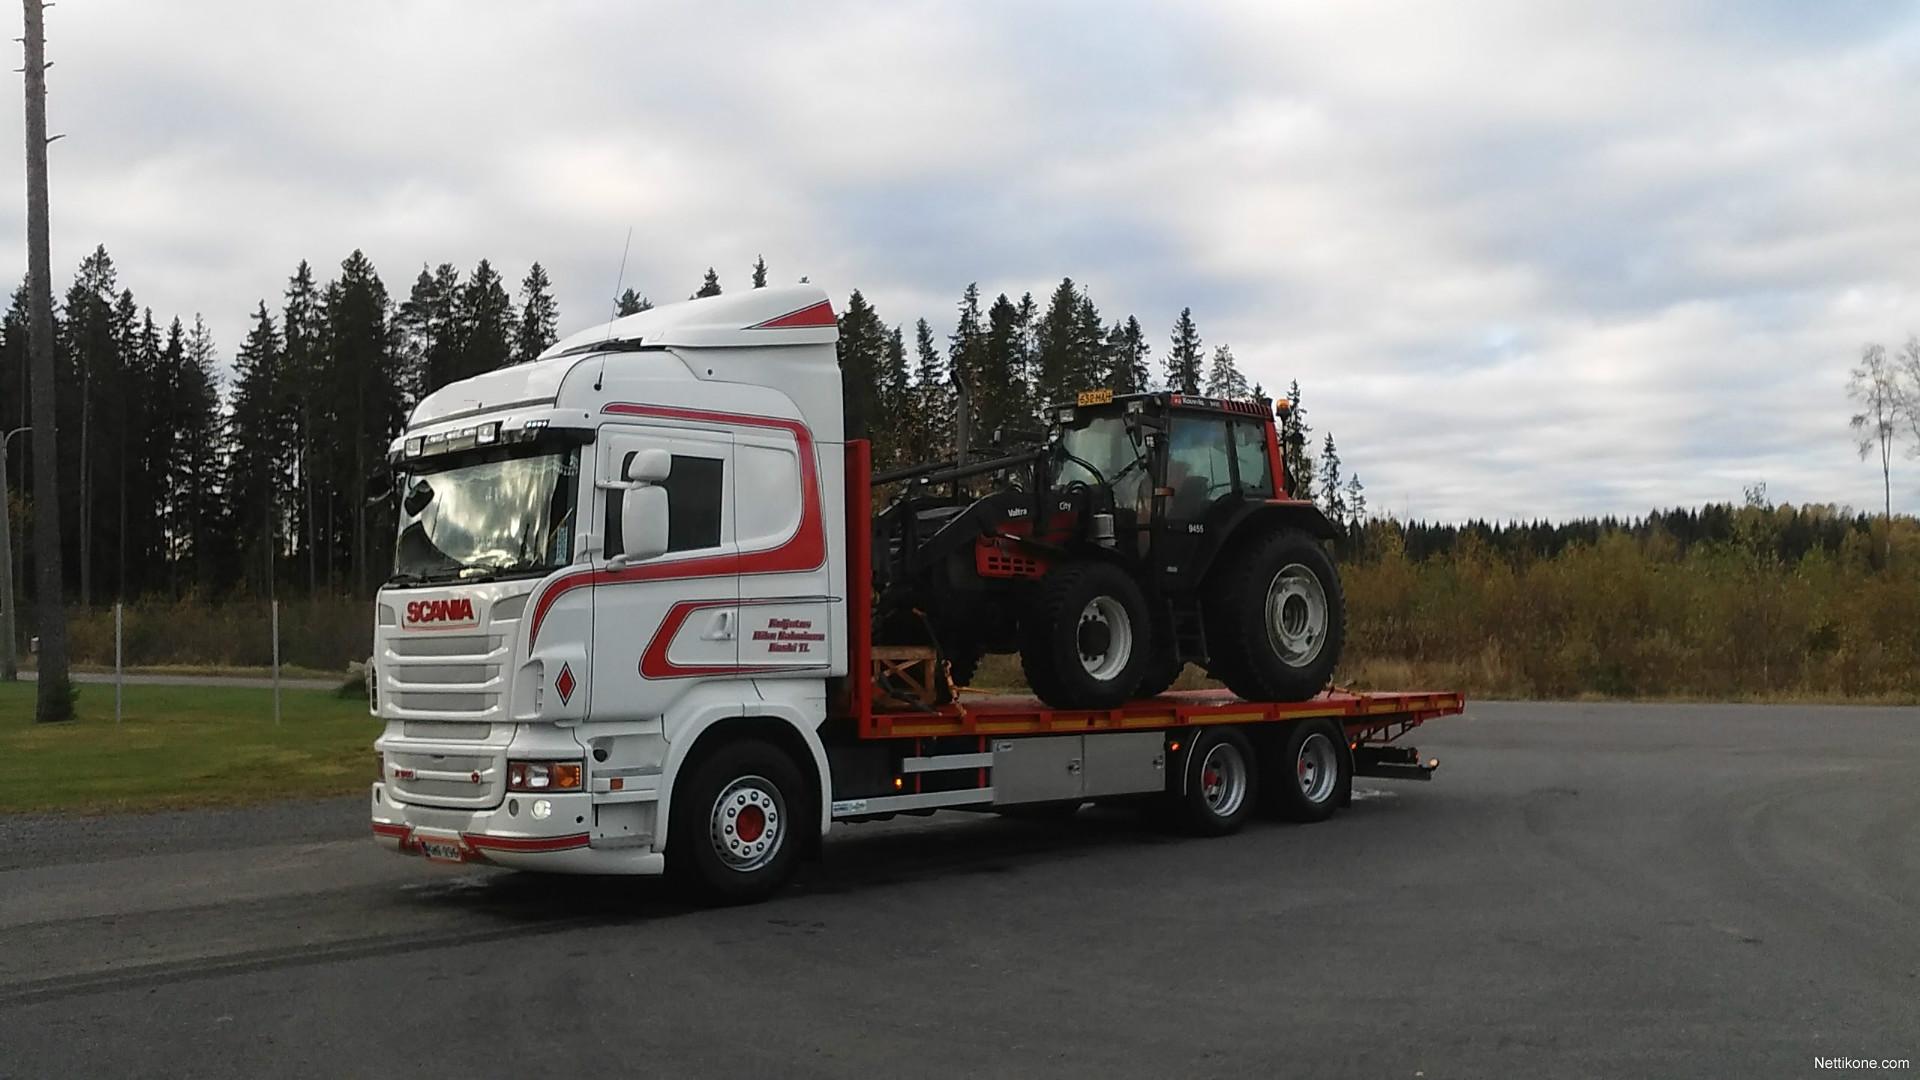 Kuljetuskalusto Scania Daa Ac C Large on Volvo Immobilizer Location